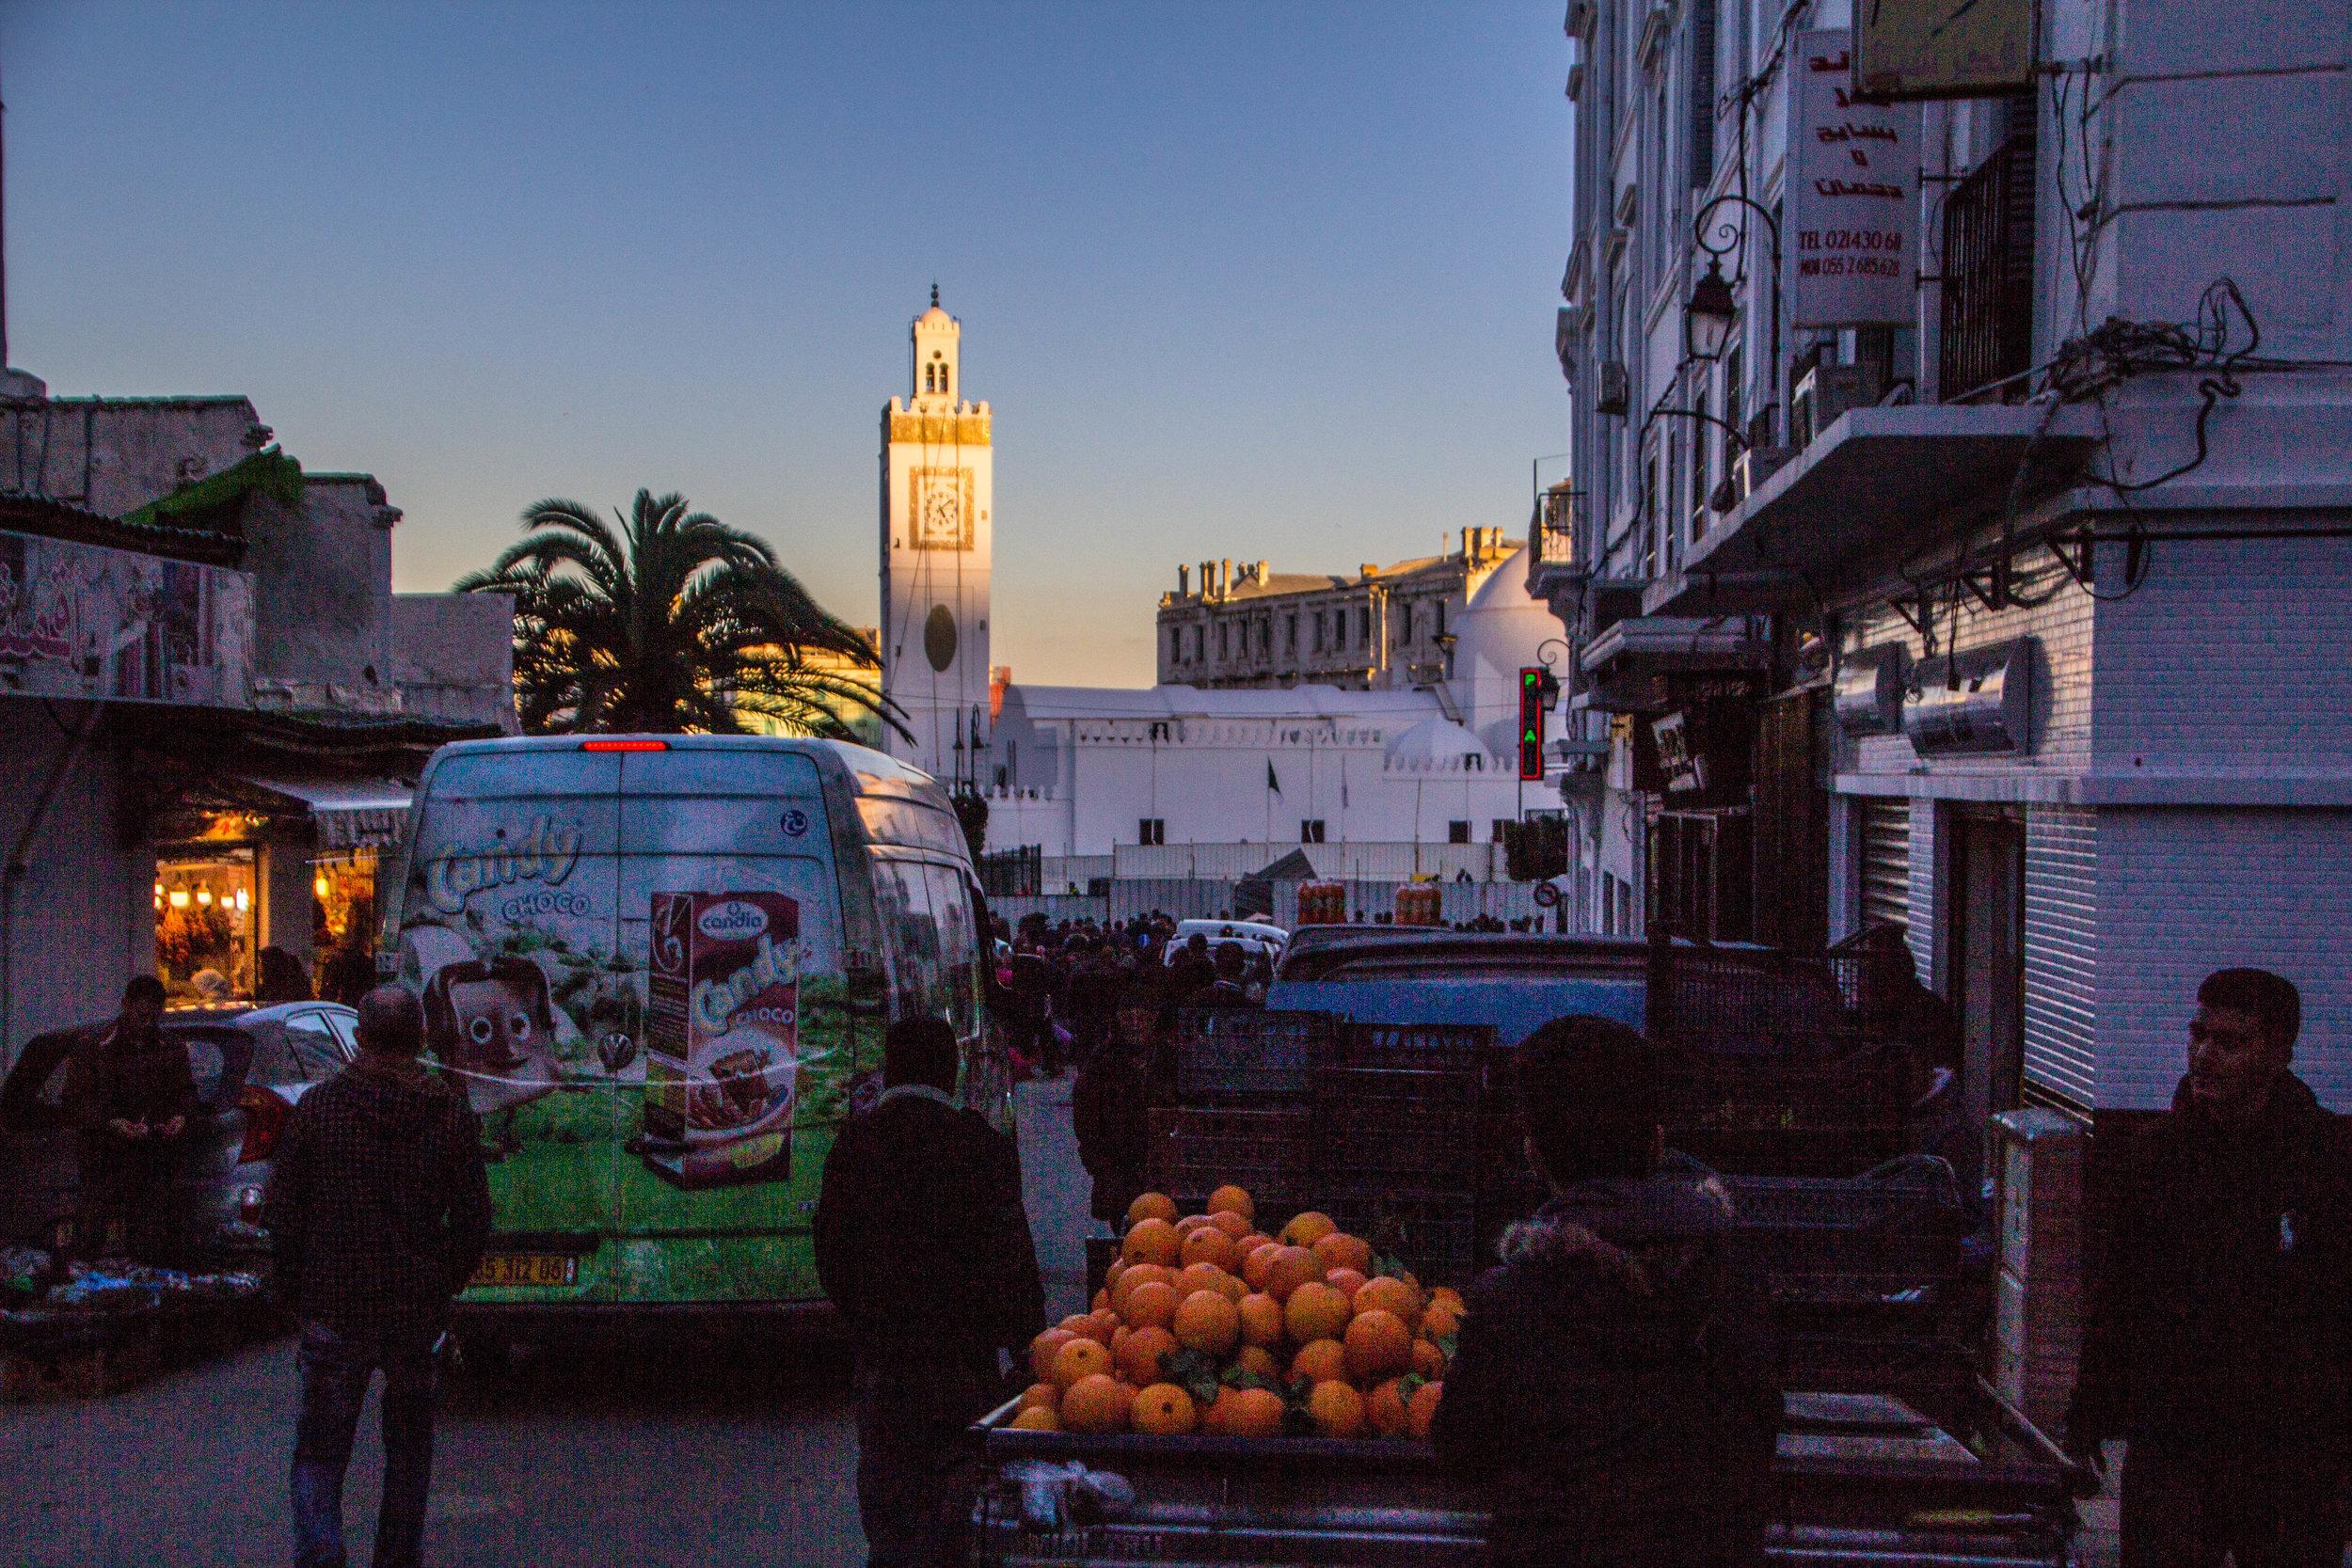 streets-algiers-algeria-48.jpg